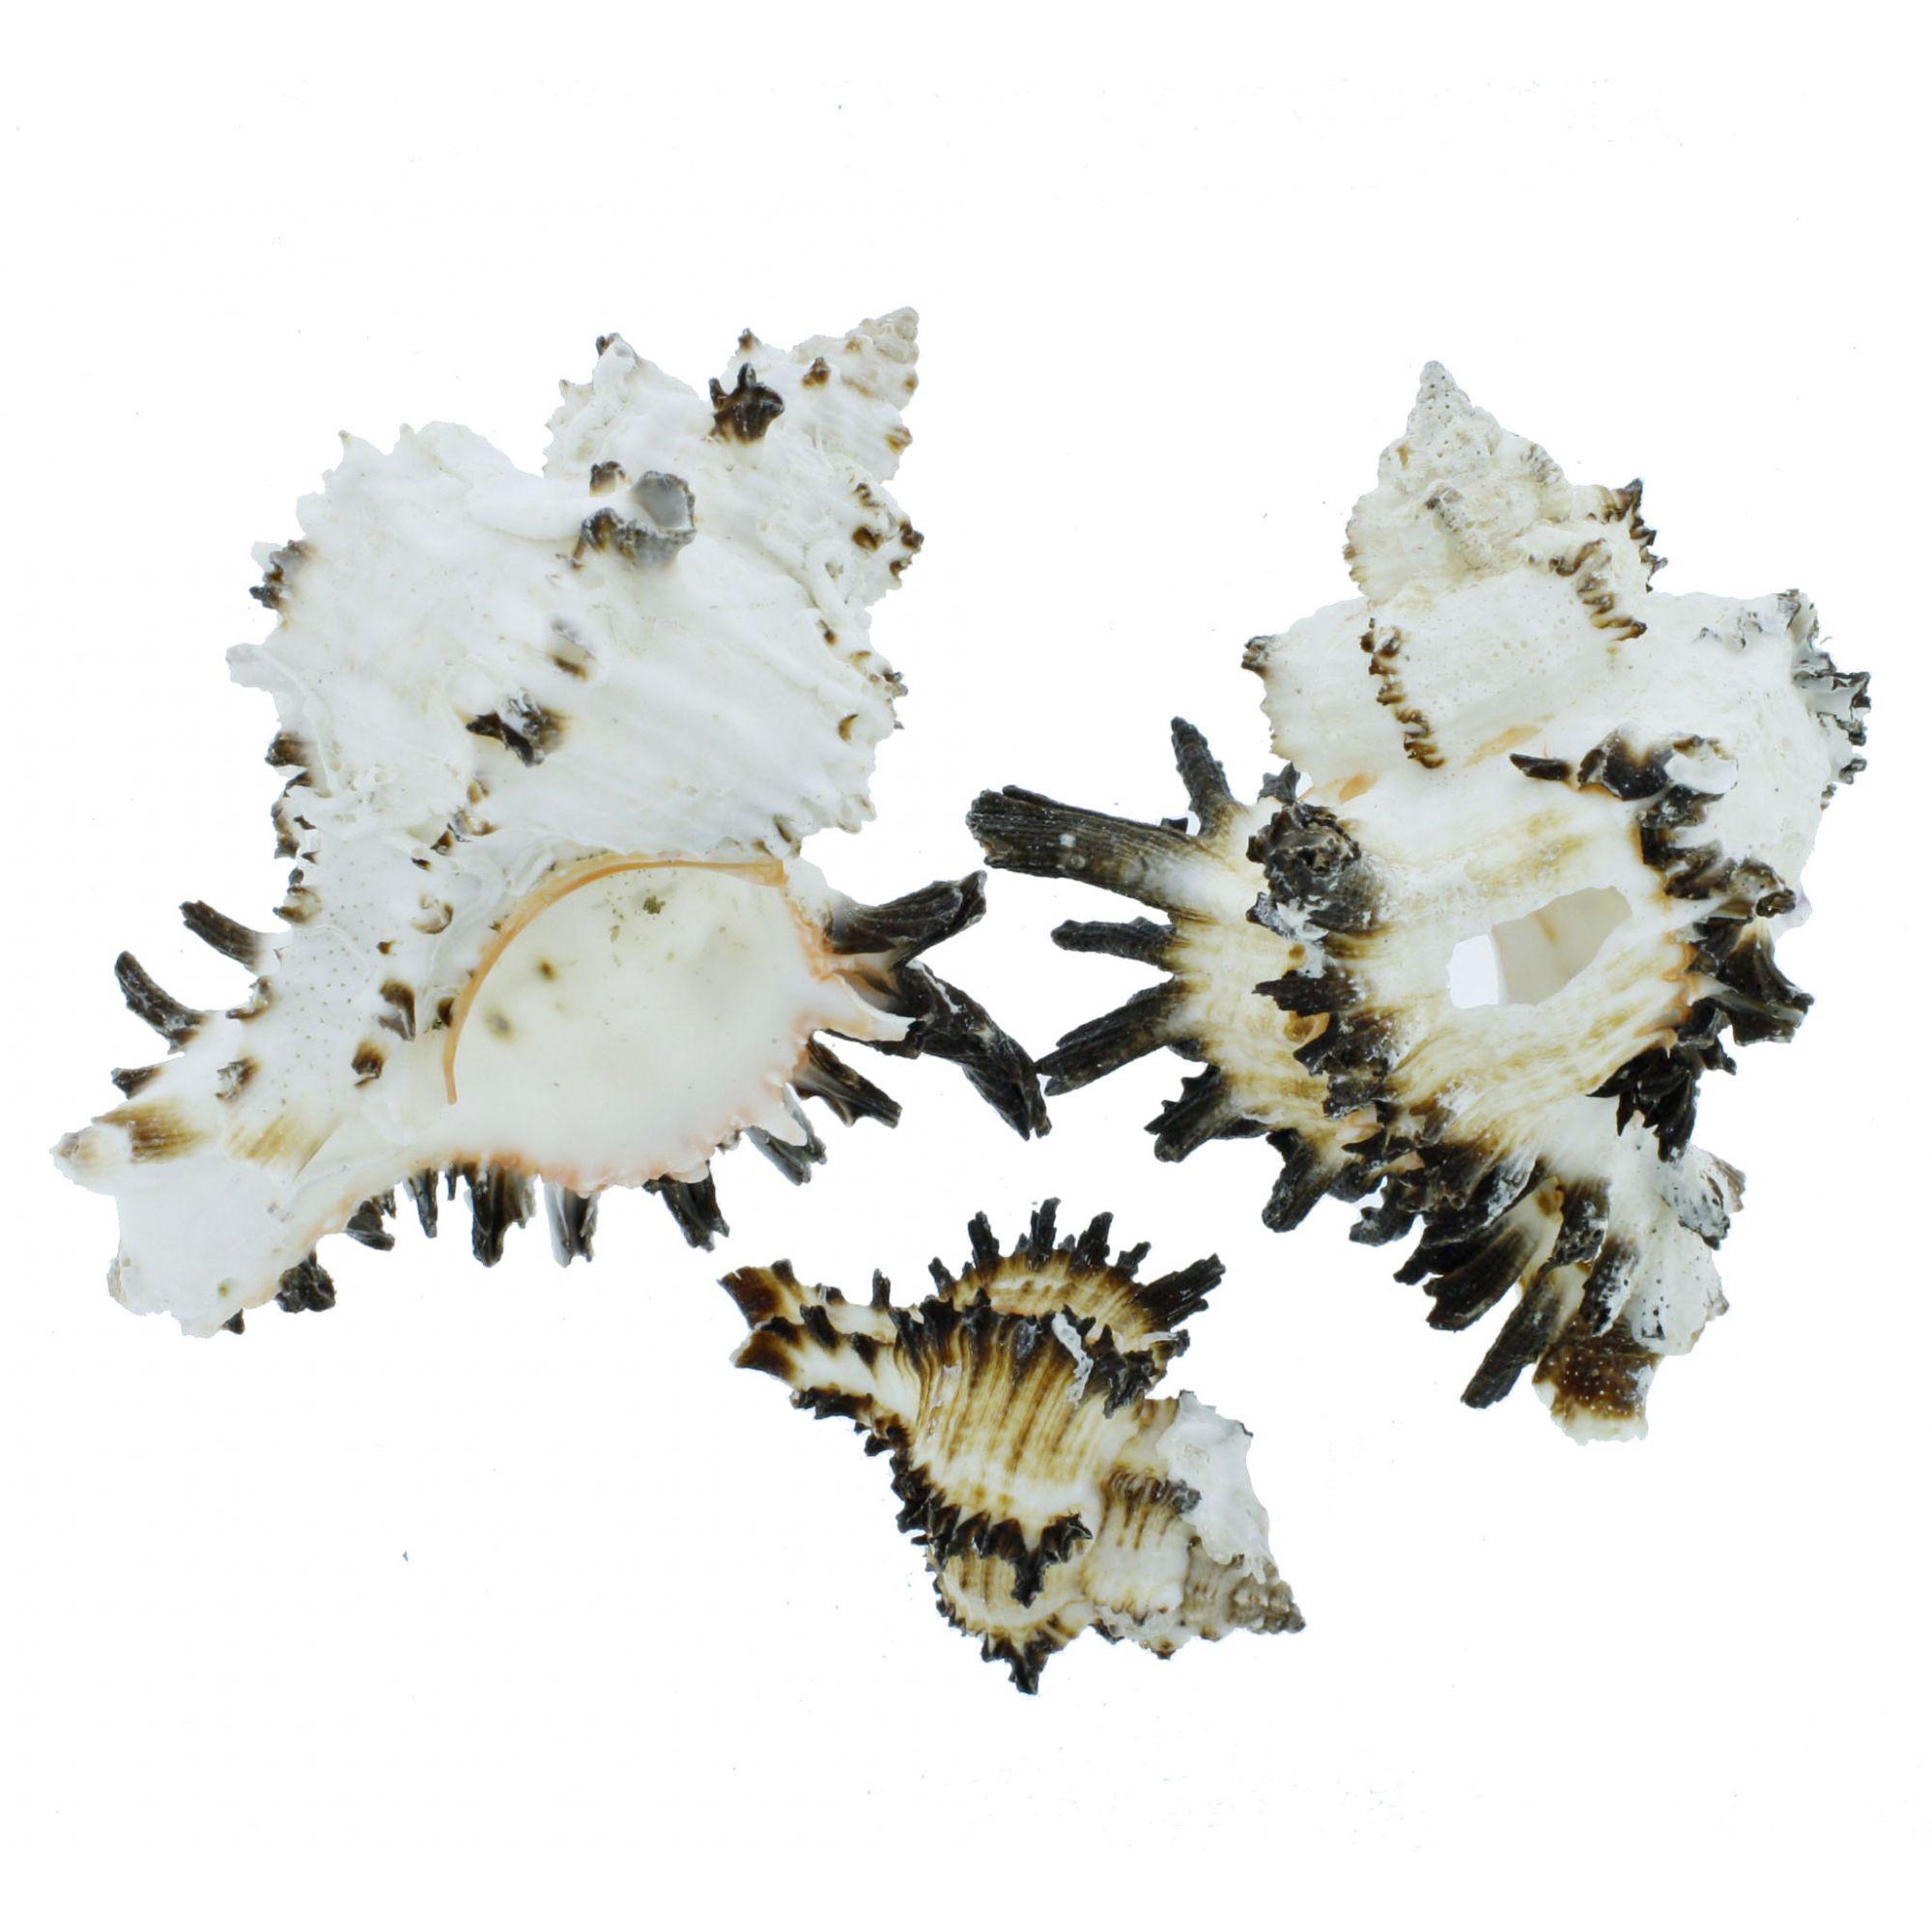 Concha - Murex Endive (Chicoreus Cichoreum)  - Stéphanie Bijoux® - Peças para Bijuterias e Artesanato